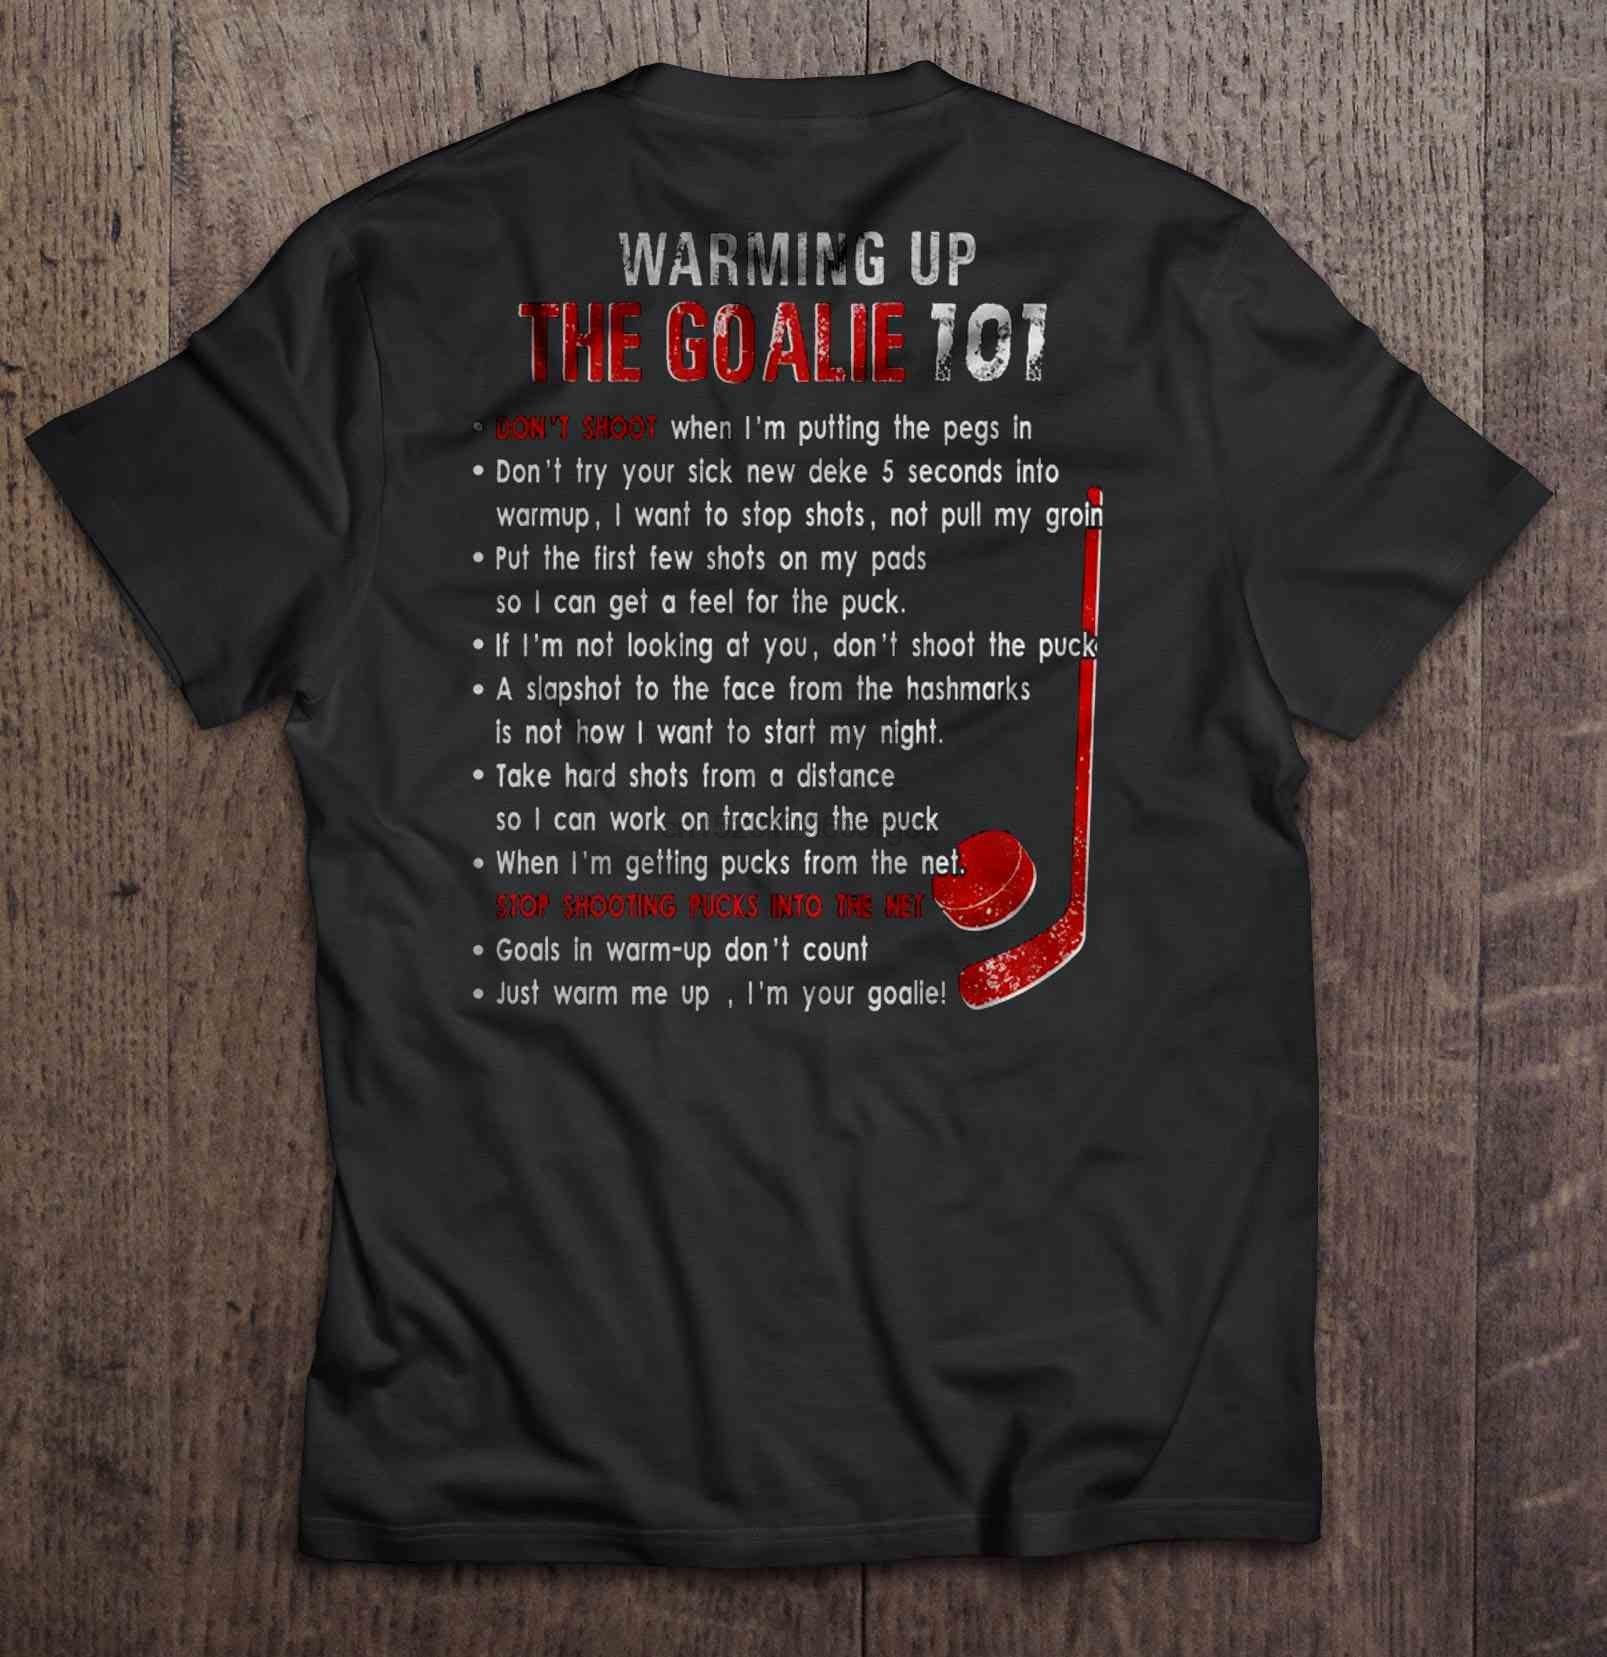 T shirt Uomo riscaldamento del portiere 101 Hockey Versione donne t-shirt